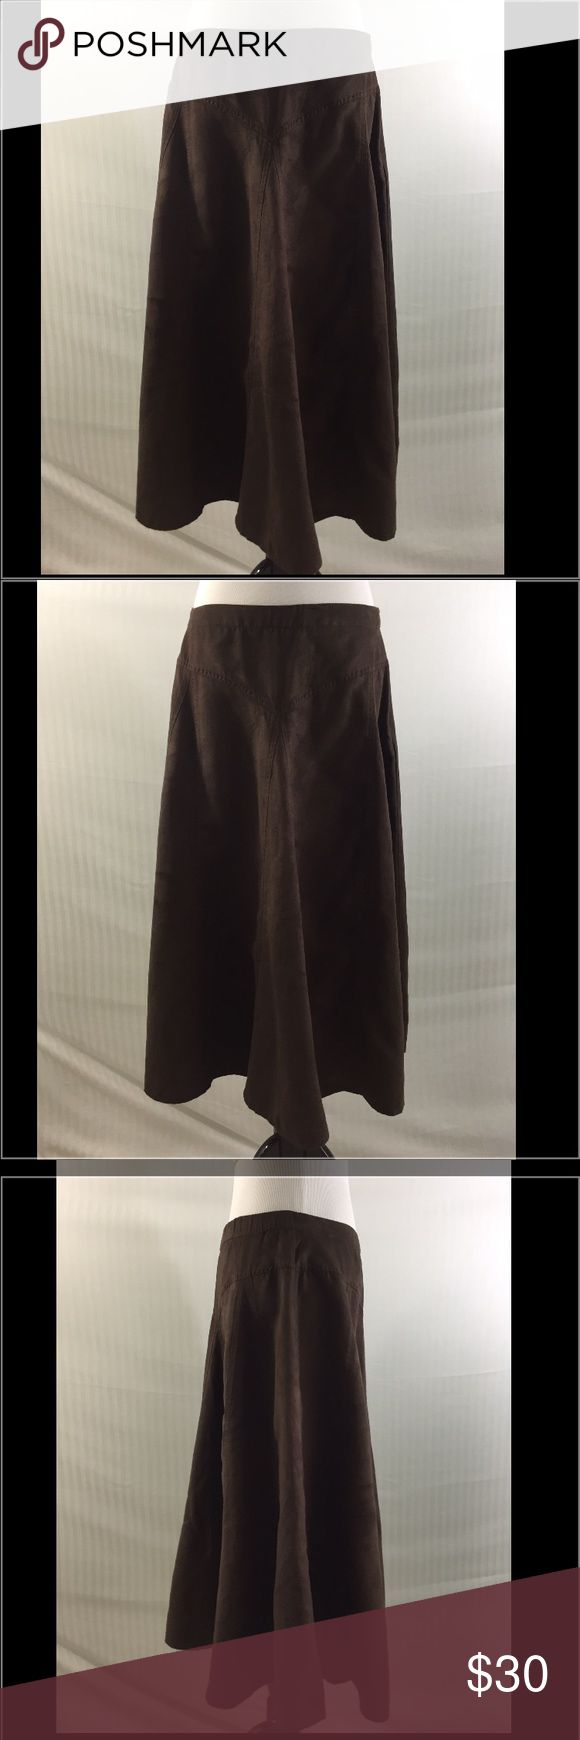 Coldwater Creek NWT Medium Brown Skirt Coldwater Creek NWT Size Medium Brown Crinkle Faux Chamois Skirt Coldwater Creek Skirts